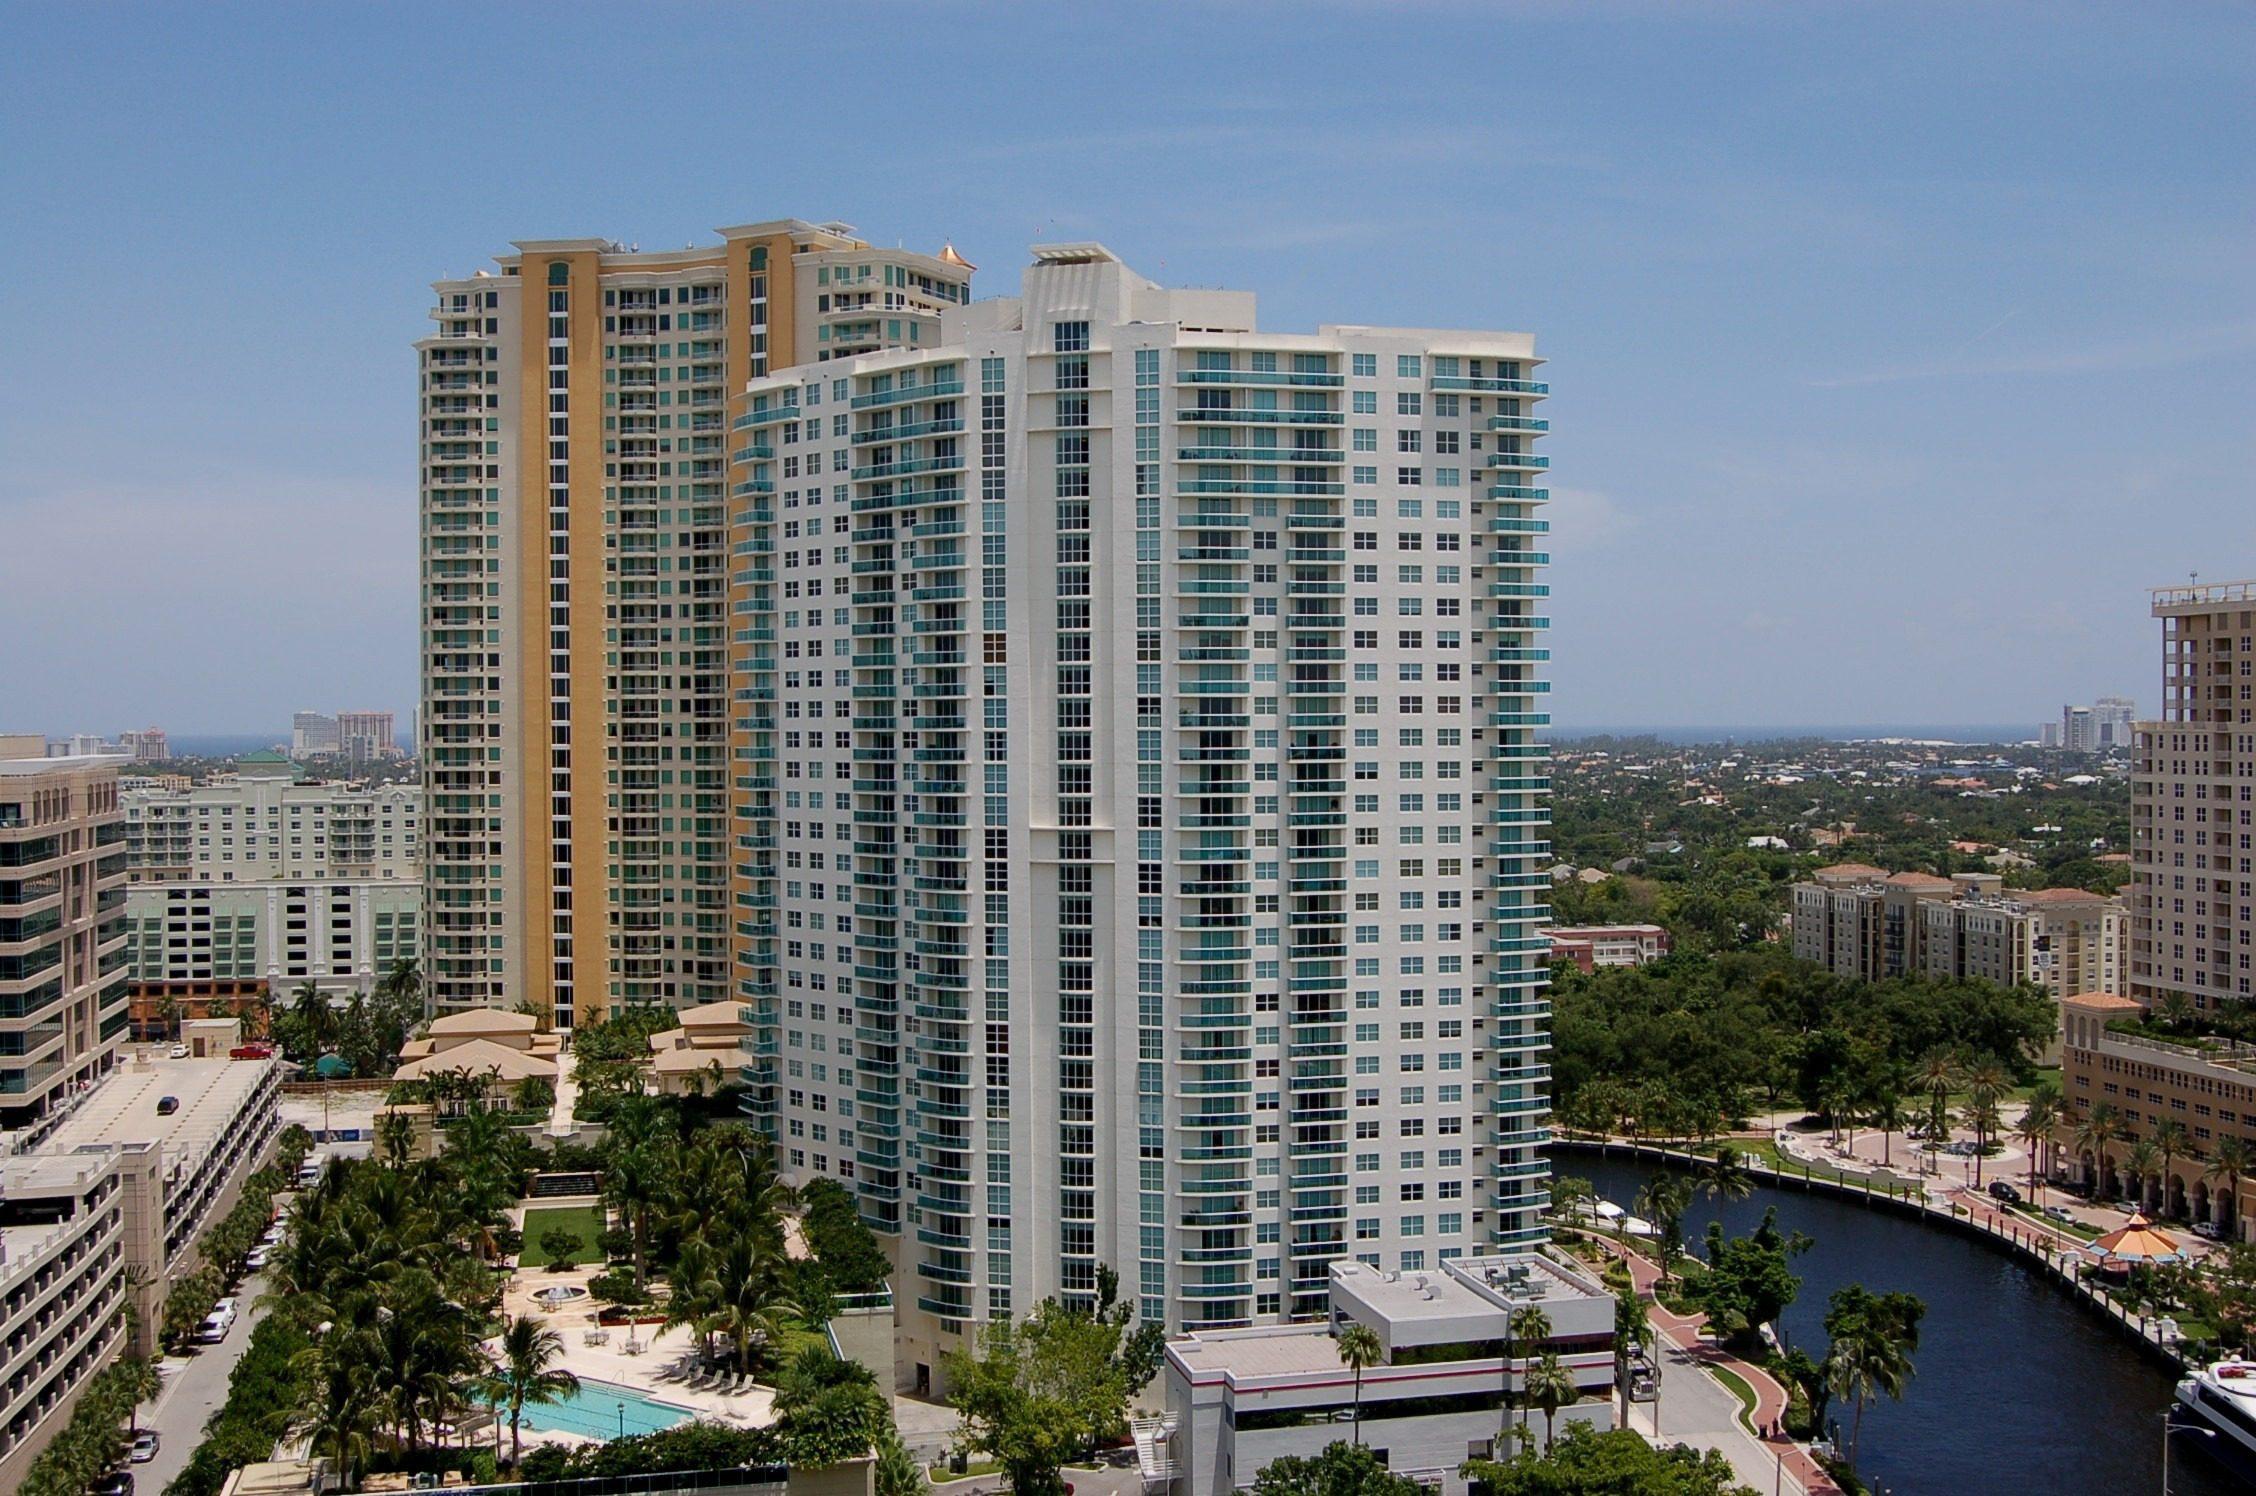 Water Garden Condos - Fort Lauderdale, FL Condos for Sale